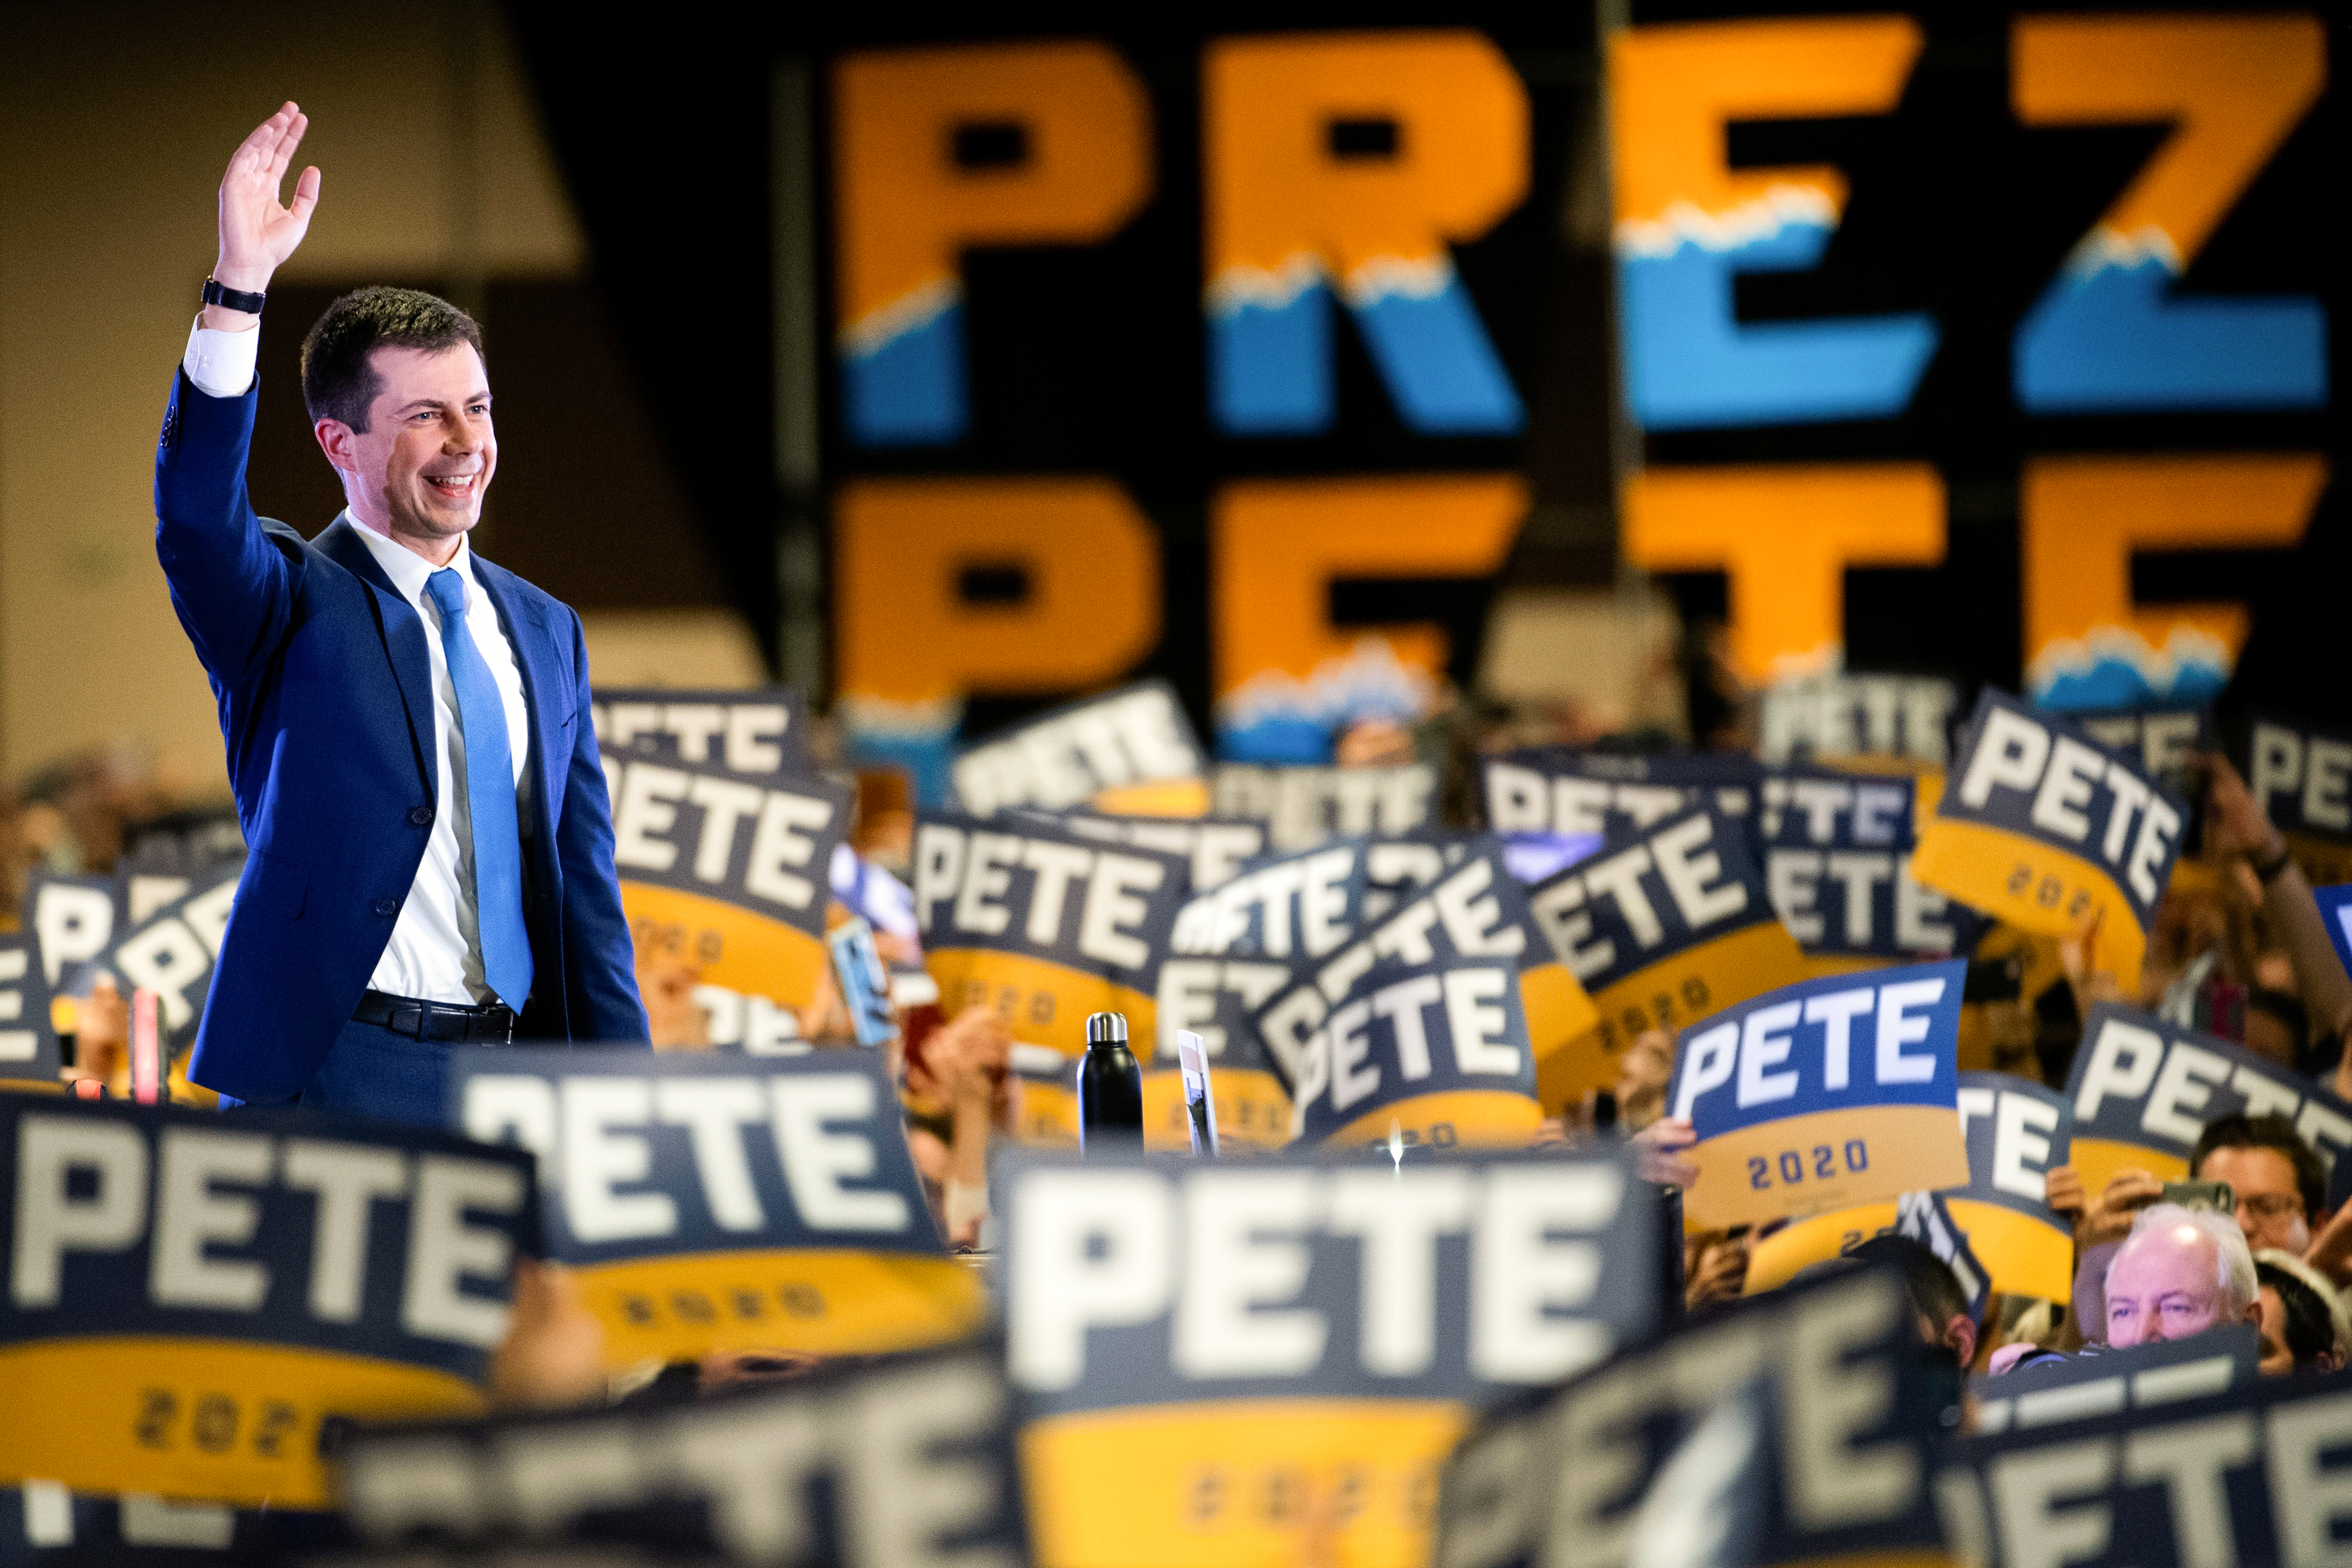 Buttigieg used his Nevada concession speech to make the case against Bernie Sanders